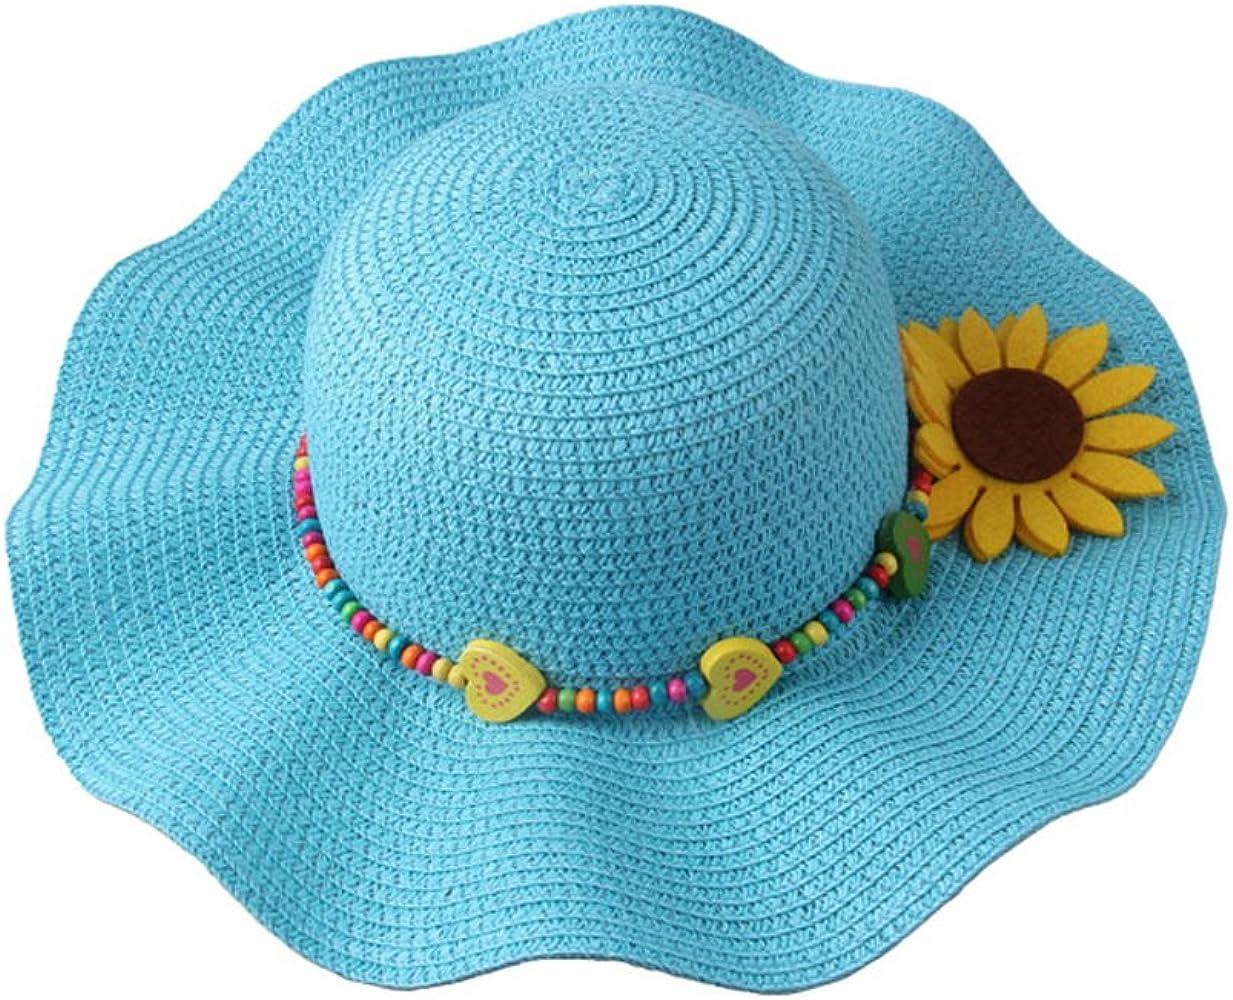 GIRLS CRUSHABLE STRAW WIDE BRIM SUN HAT WITH FLOWERS SIZES 52CM 54CM 56CM